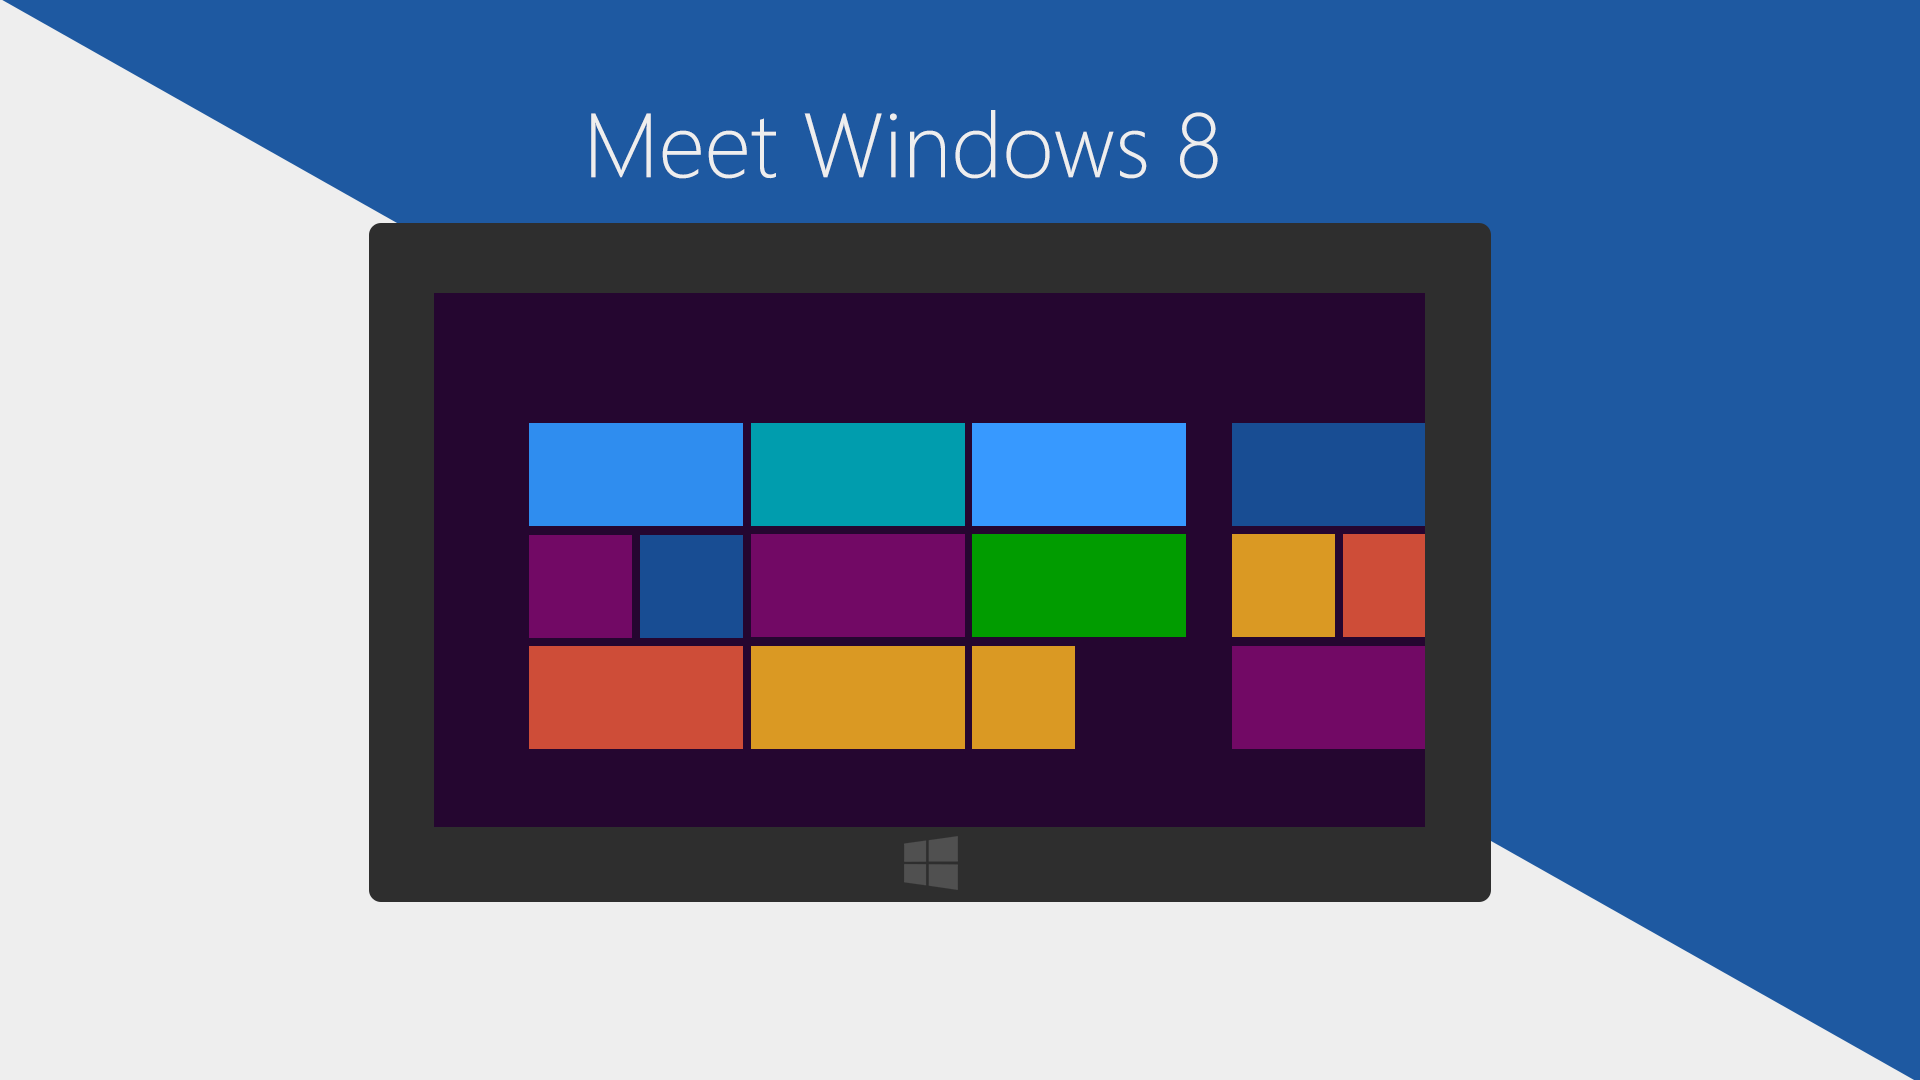 Meet Windows 8 by Brebenel-Silviu